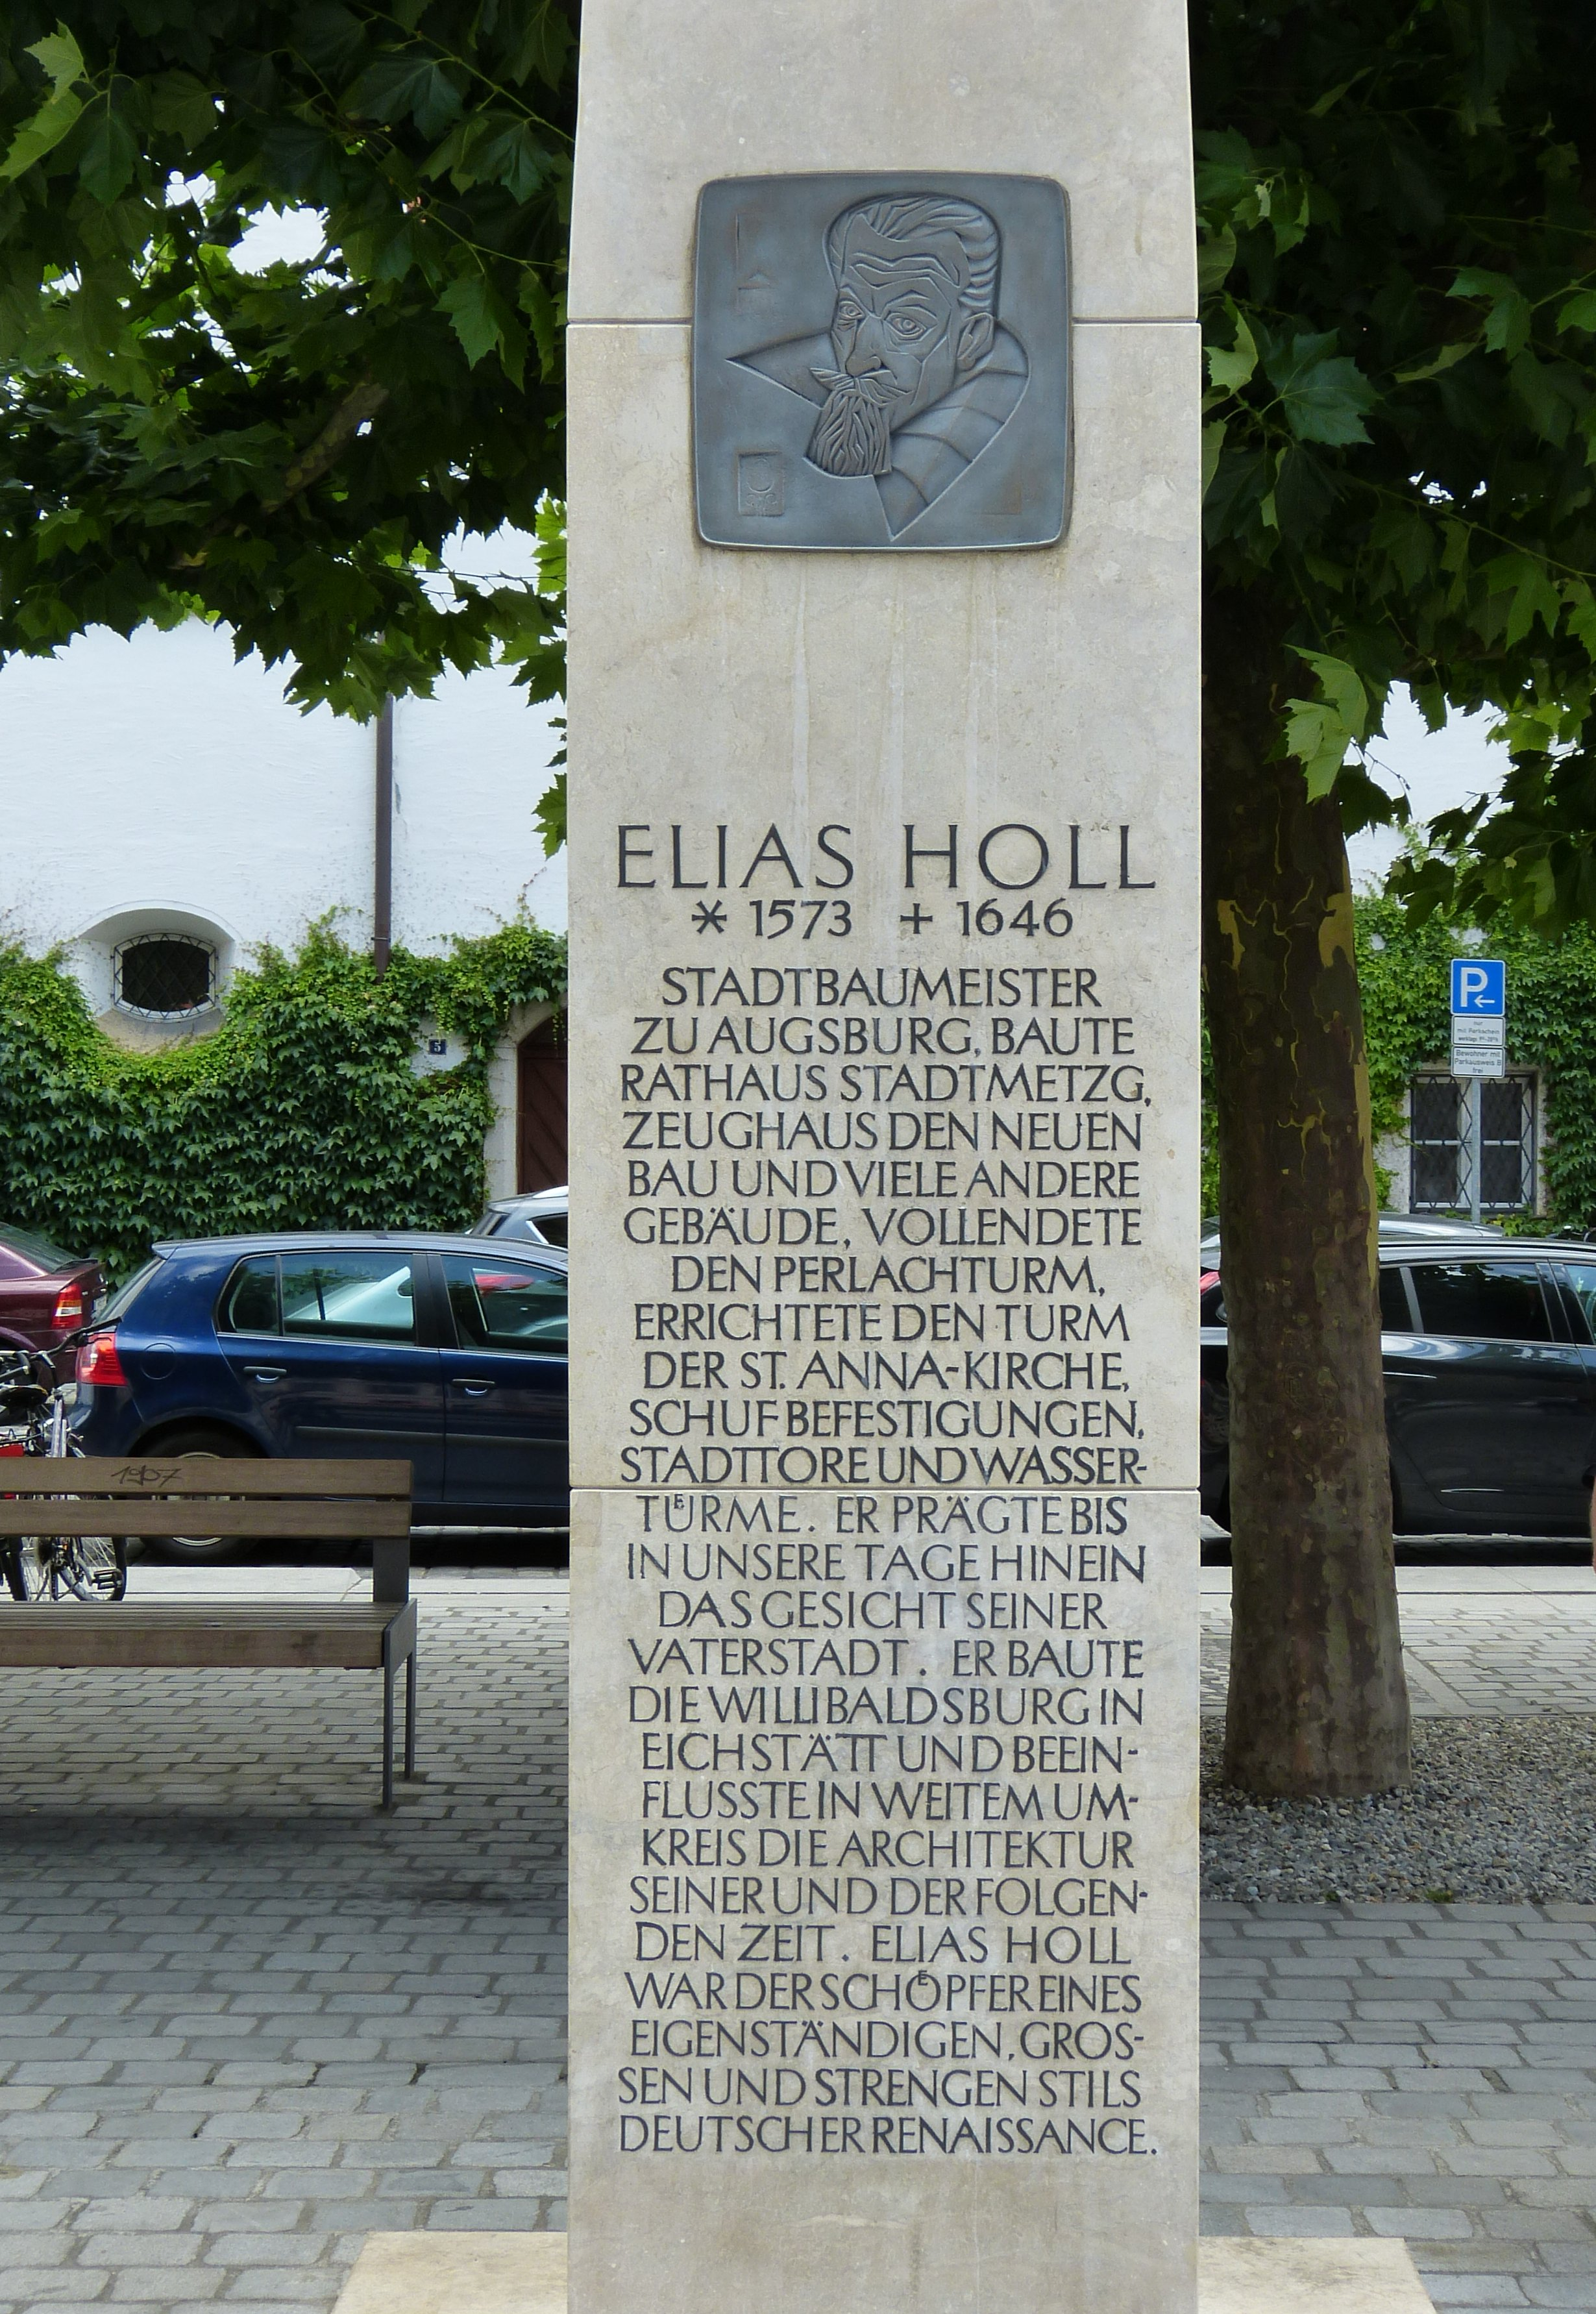 File:Augsburg Elias-Holl-Denkmal 02.jpg - Wikimedia Commons